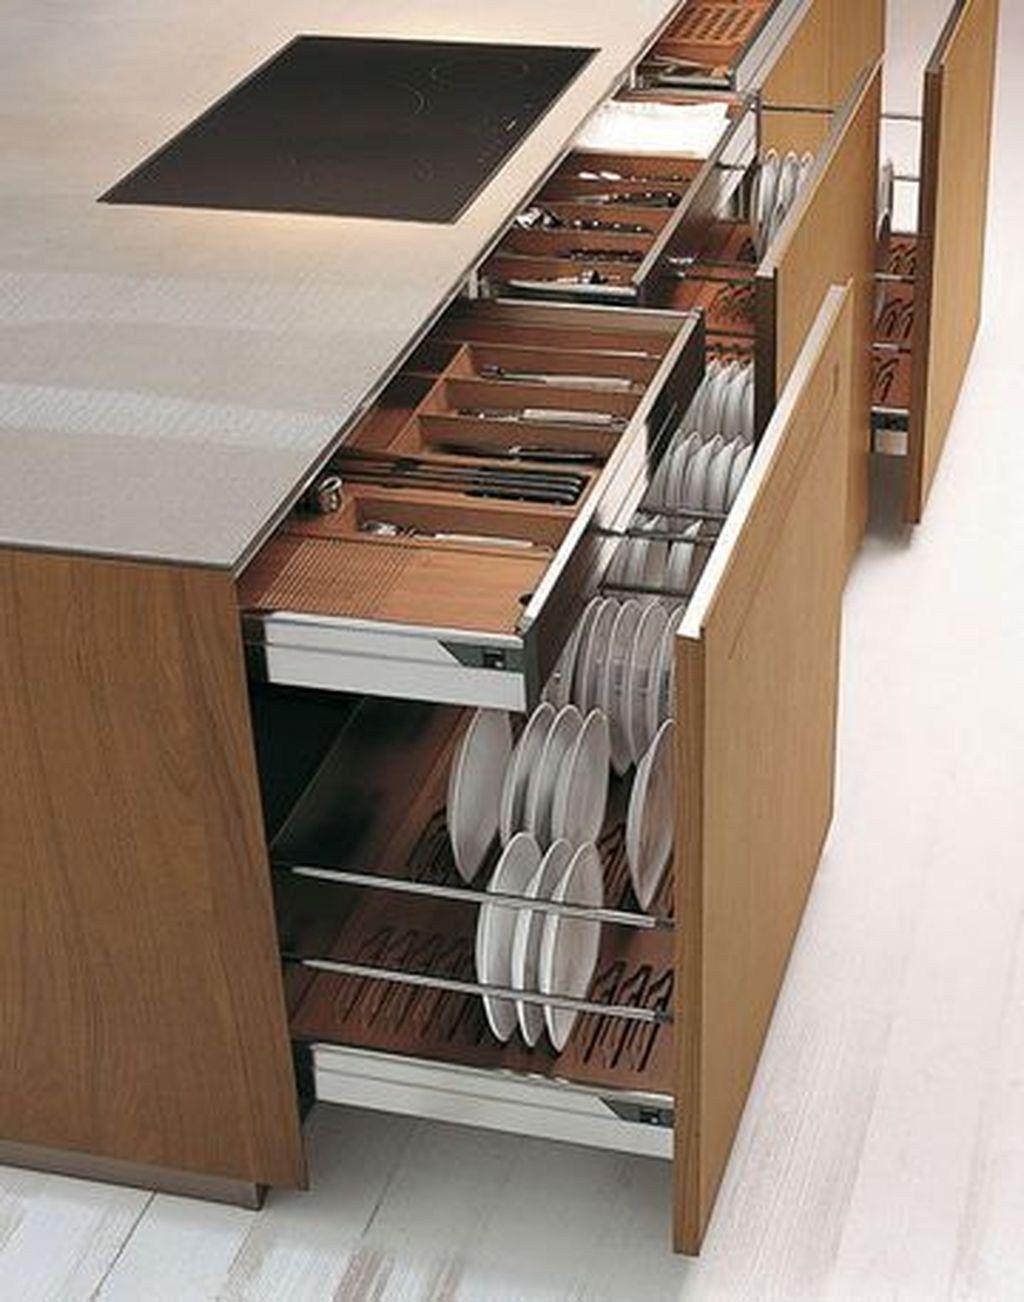 Tiny Kitchen Storage Ideas